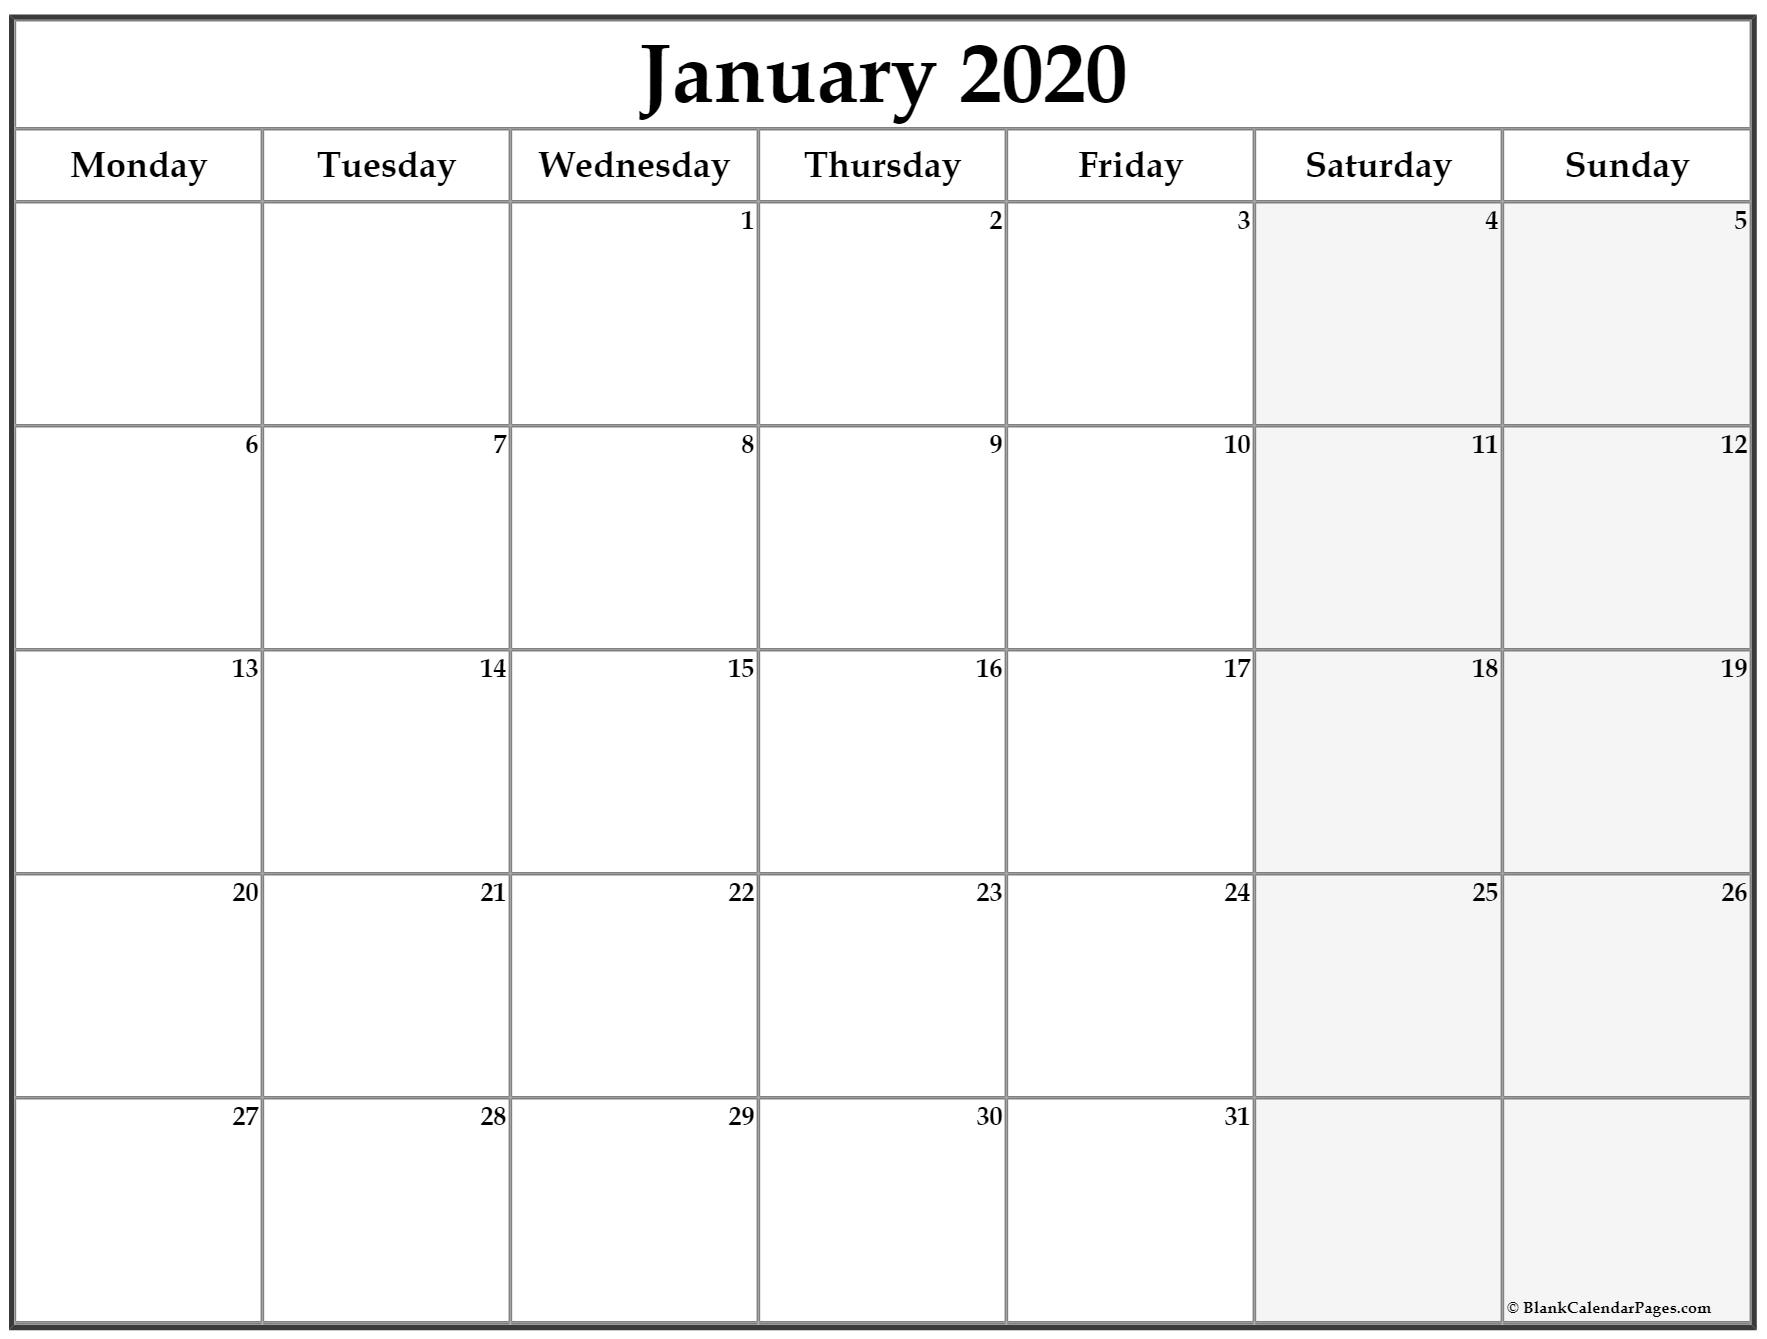 January 2020 Monday Calendar | Monday To Sunday with regard to Printable Monday To Sunday 2020 Calendar